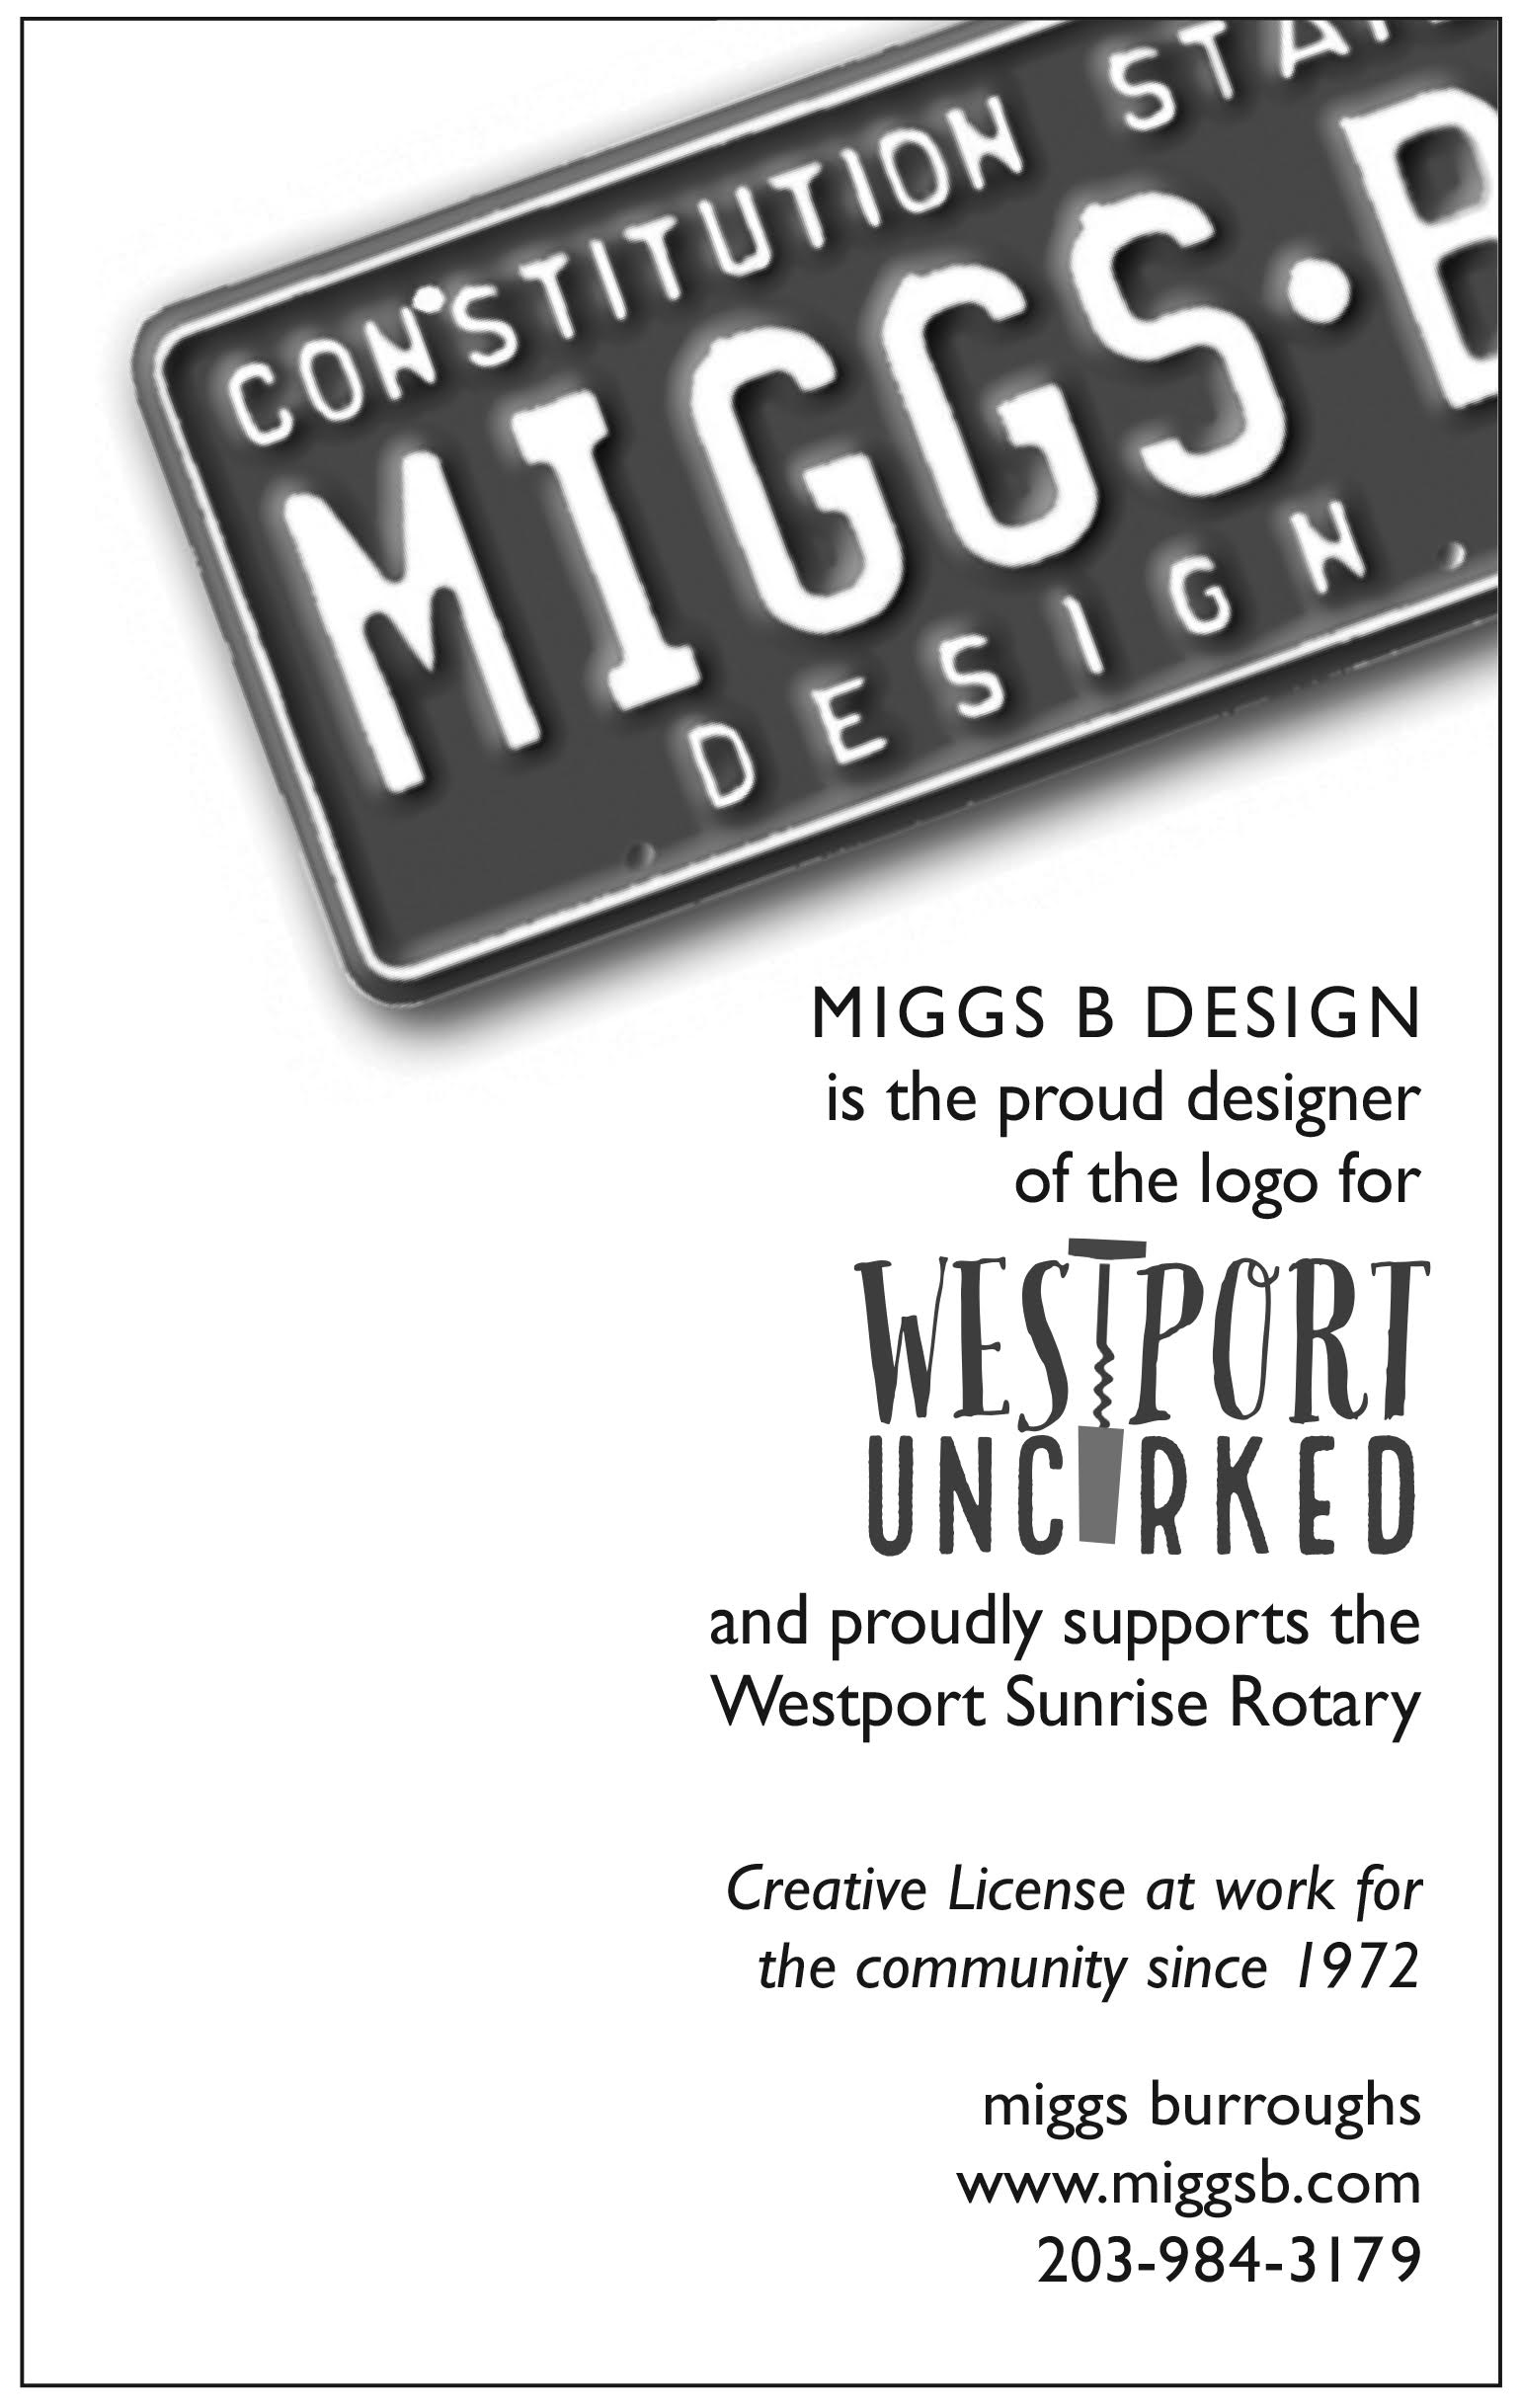 Miggs Ad 11 18 18 B.jpg